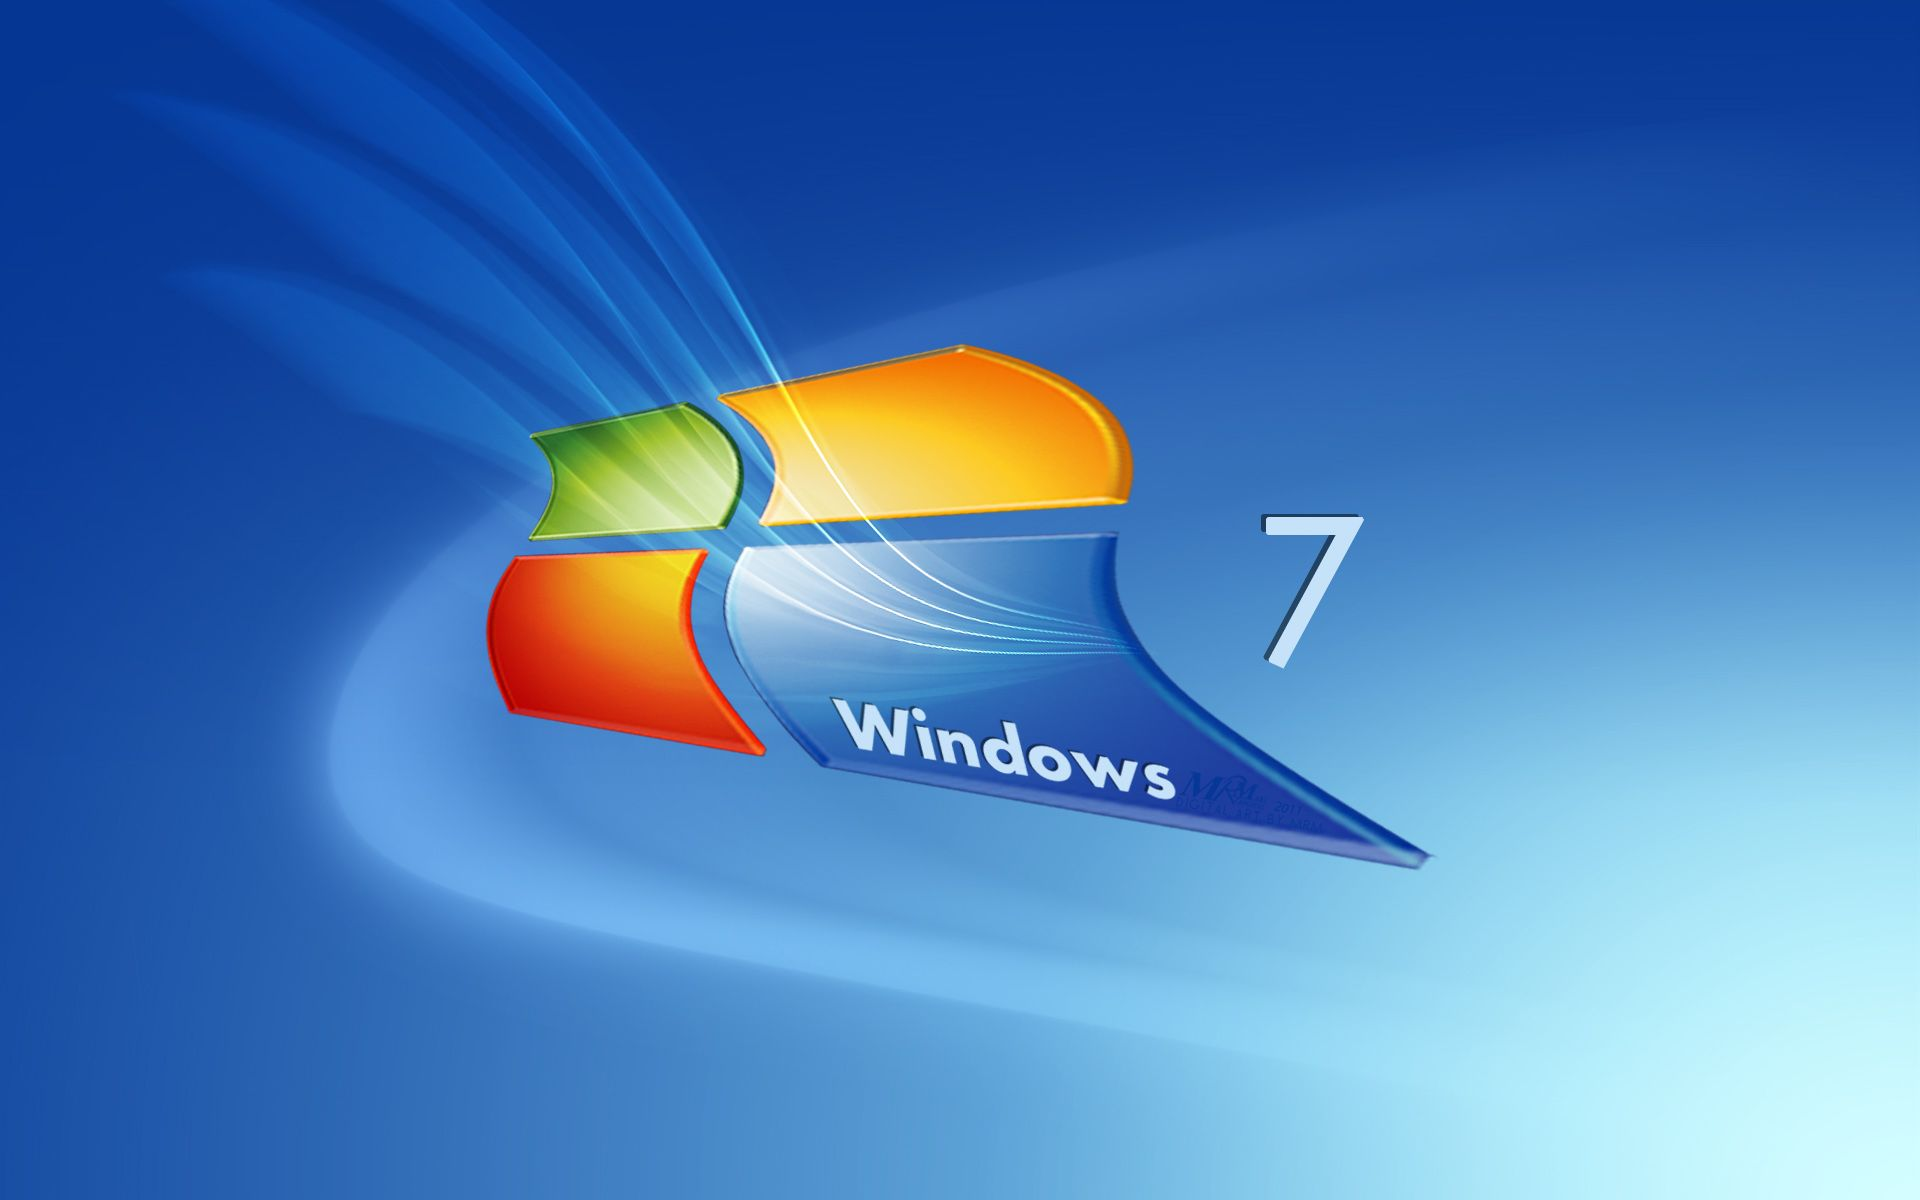 Cute Desktop Backgrounds Windows 7